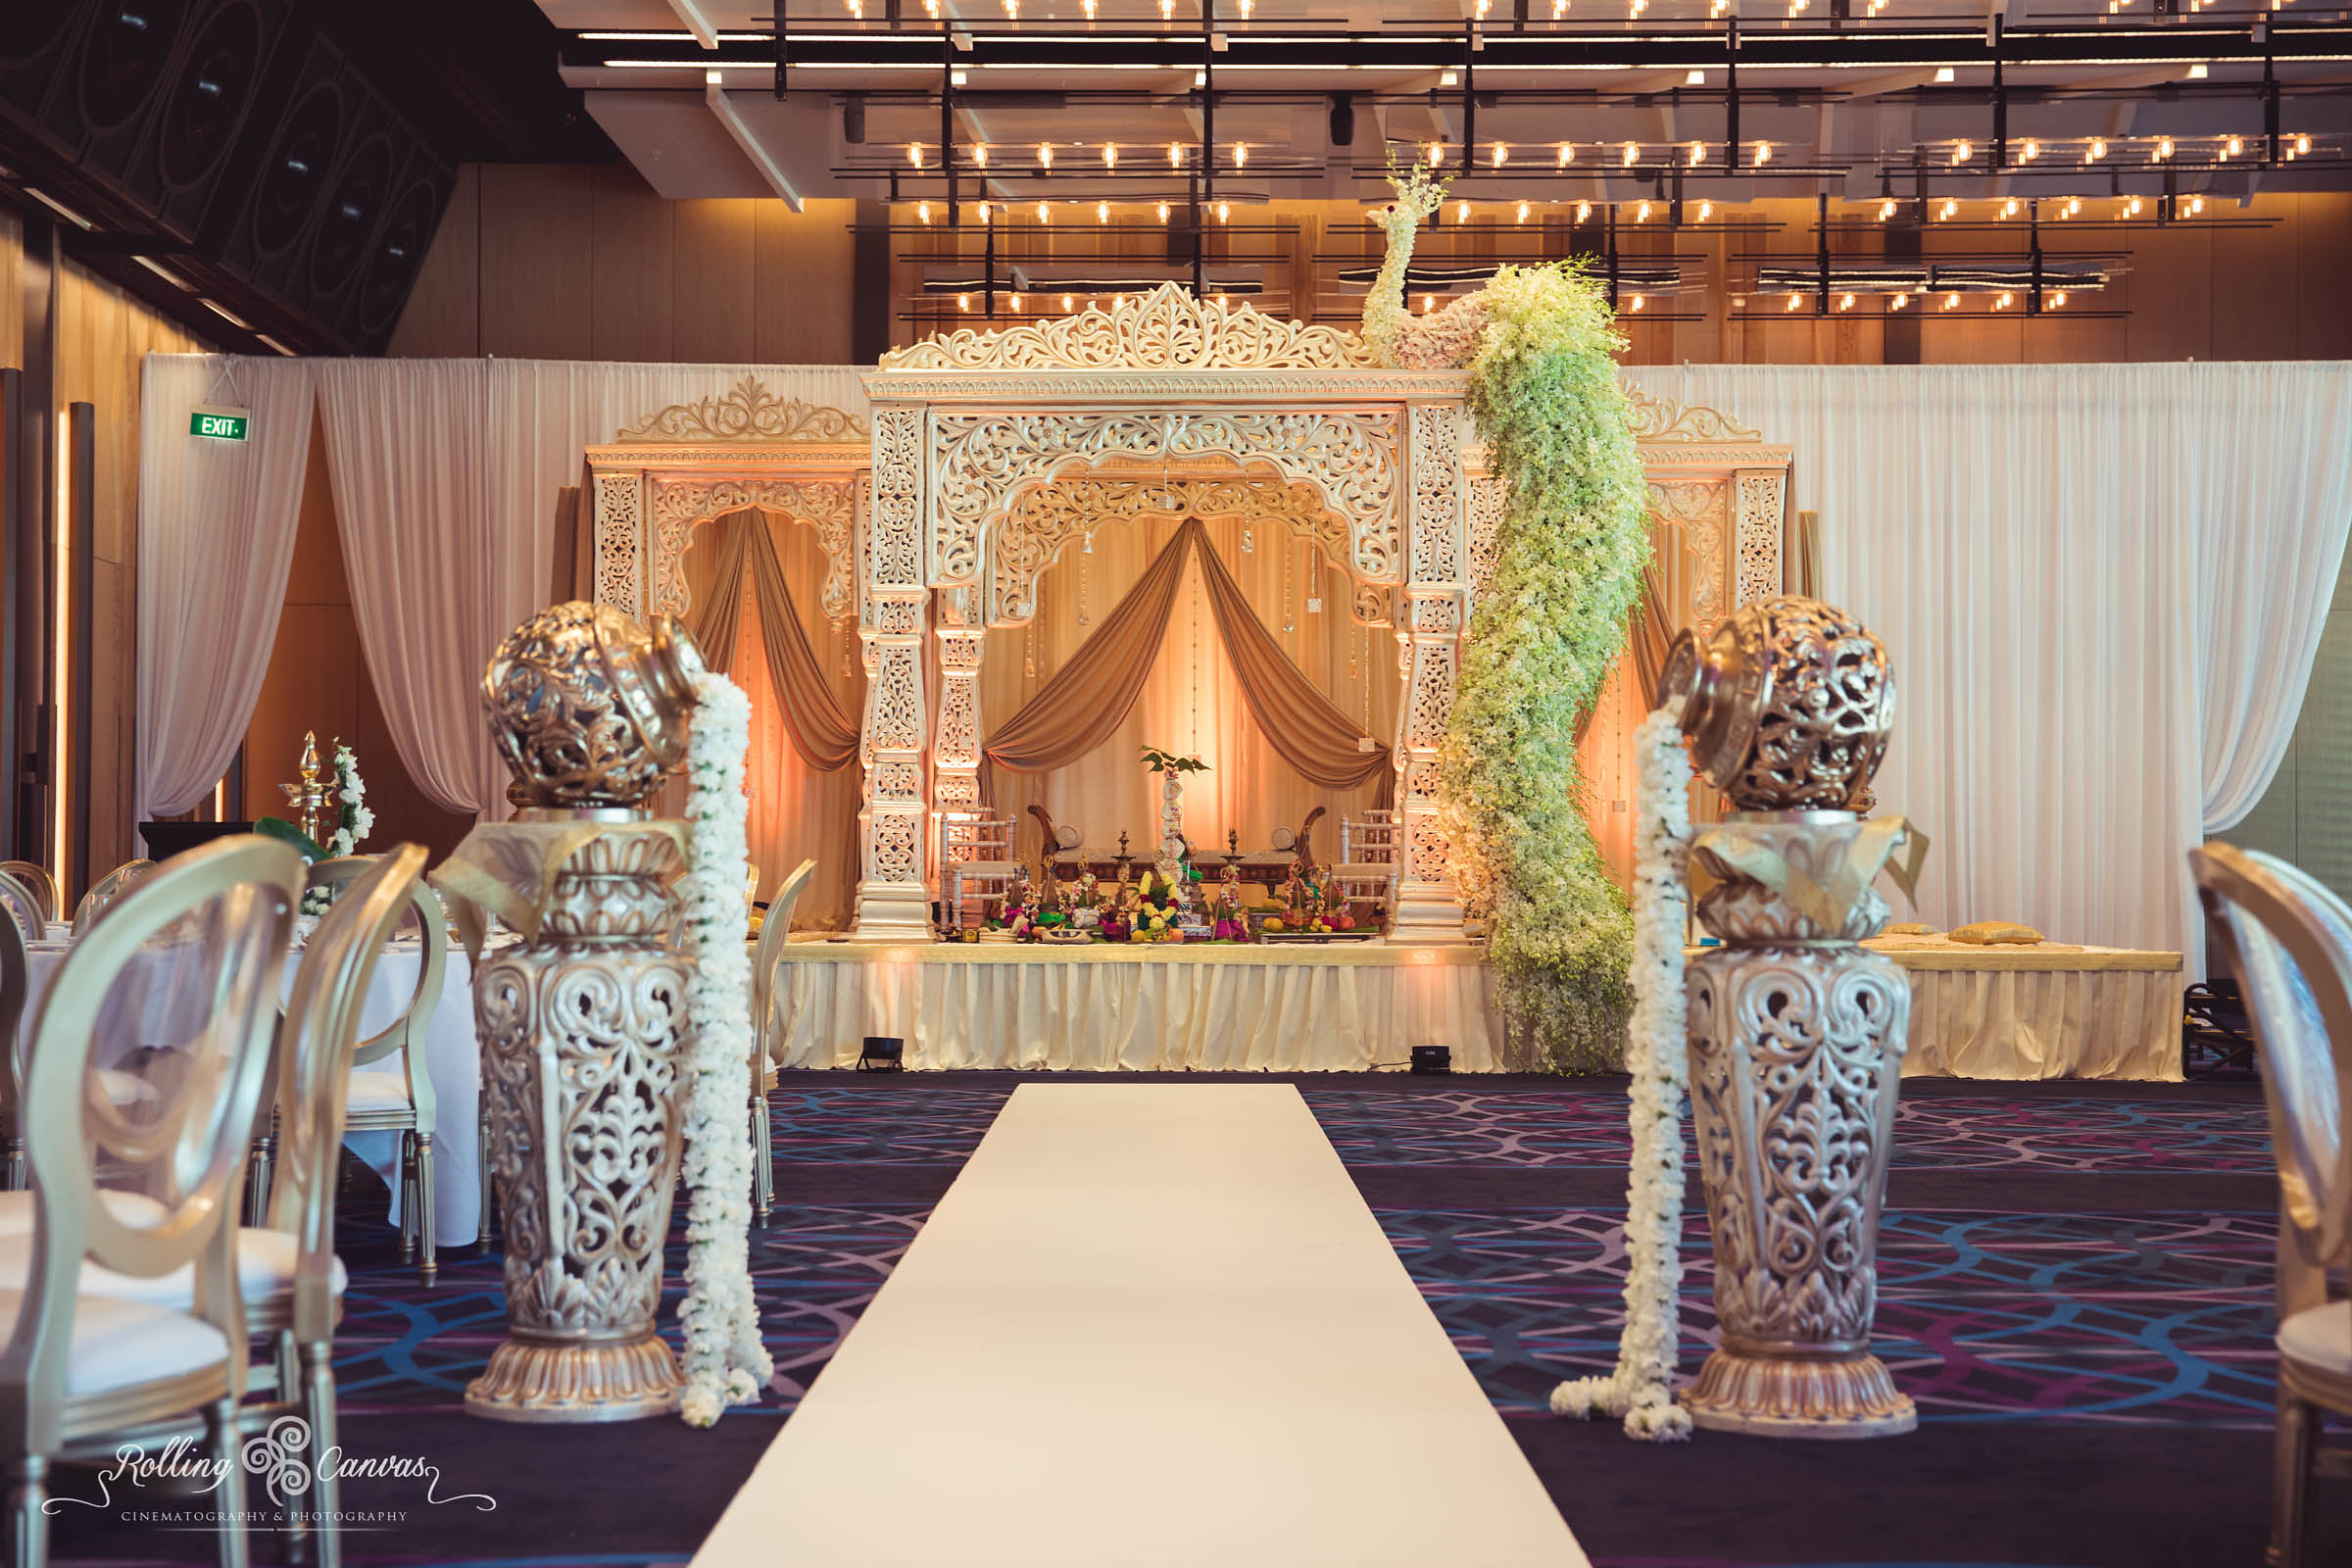 Wedding_Photography_Sydney_Rolling_Canvas_Presentation_Hindu_Ceremony_Mandap_Hyatt_Regency_Floral_Design-57073.jpg